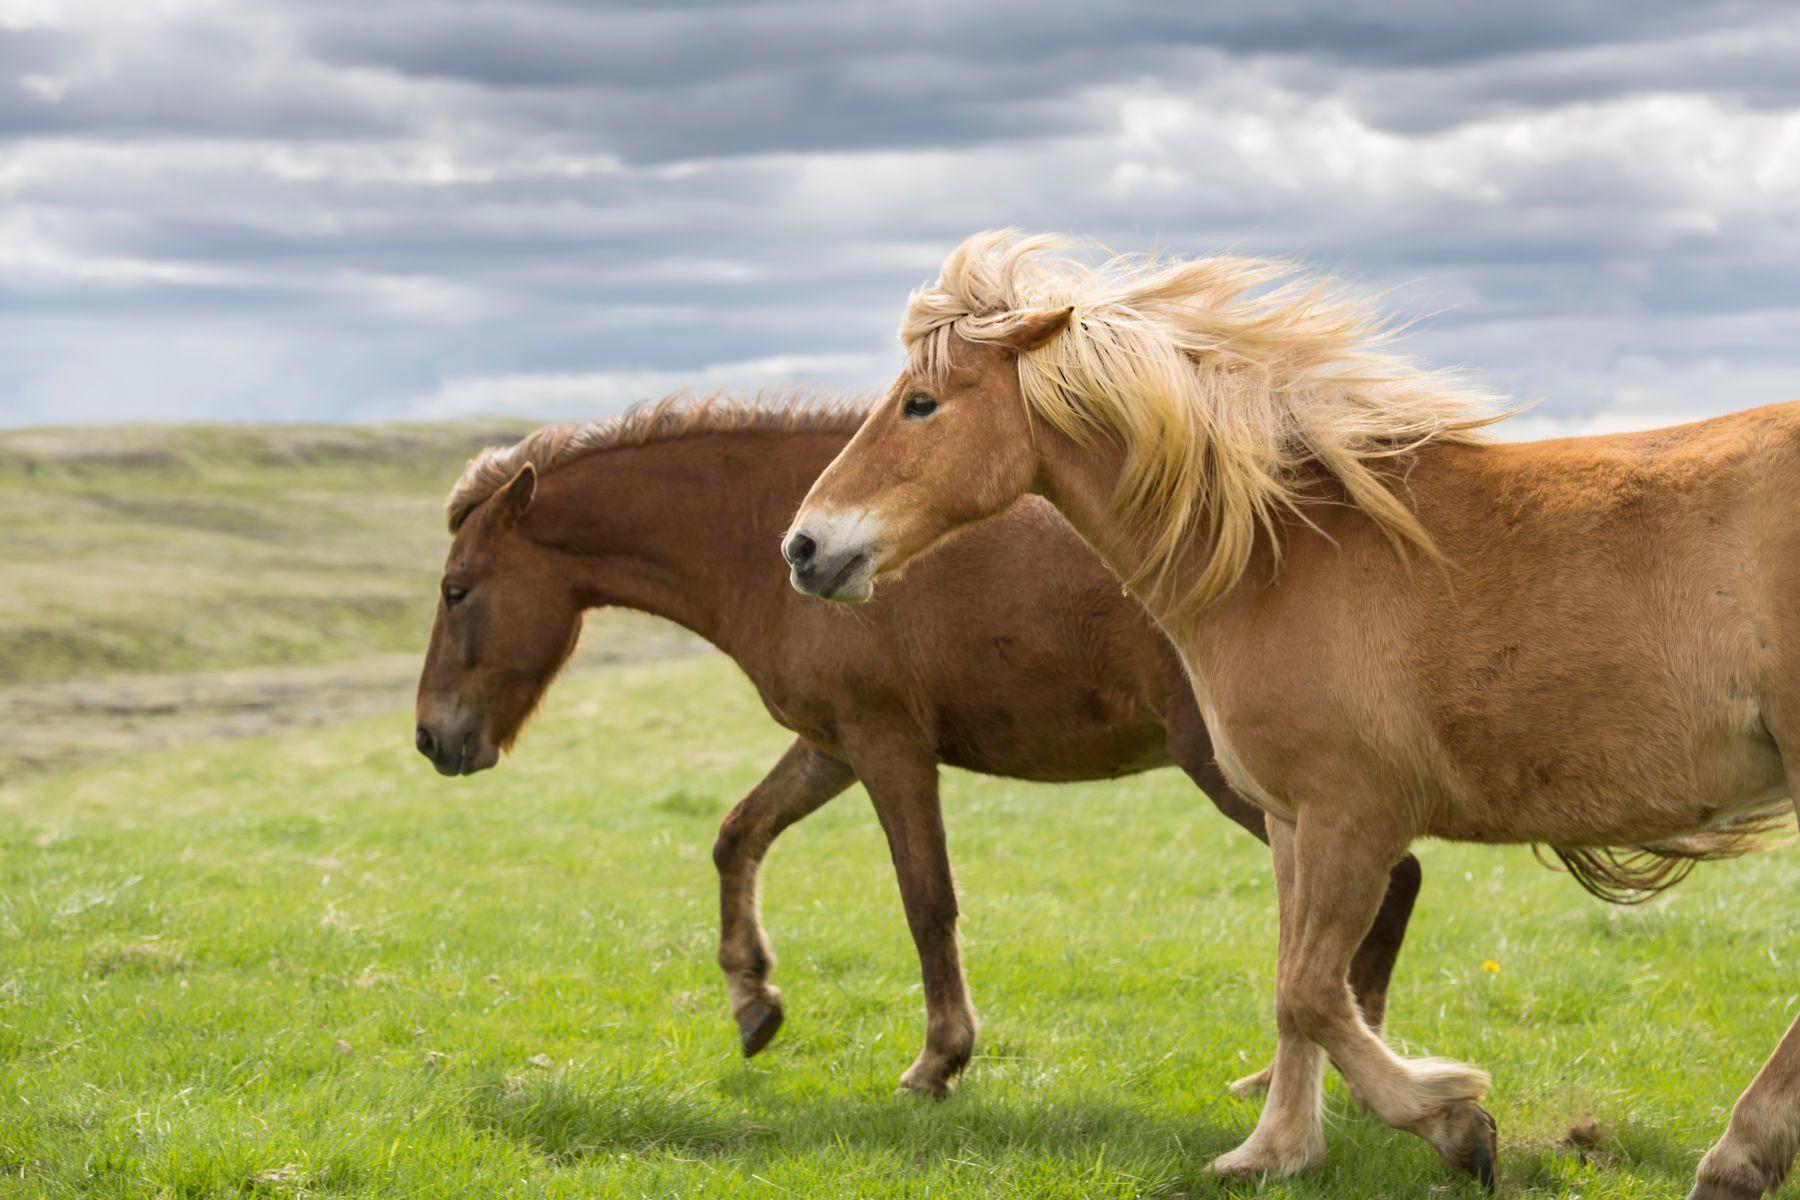 4_0_292_1islandic_horses_jeanine_thurston_1002.jpg